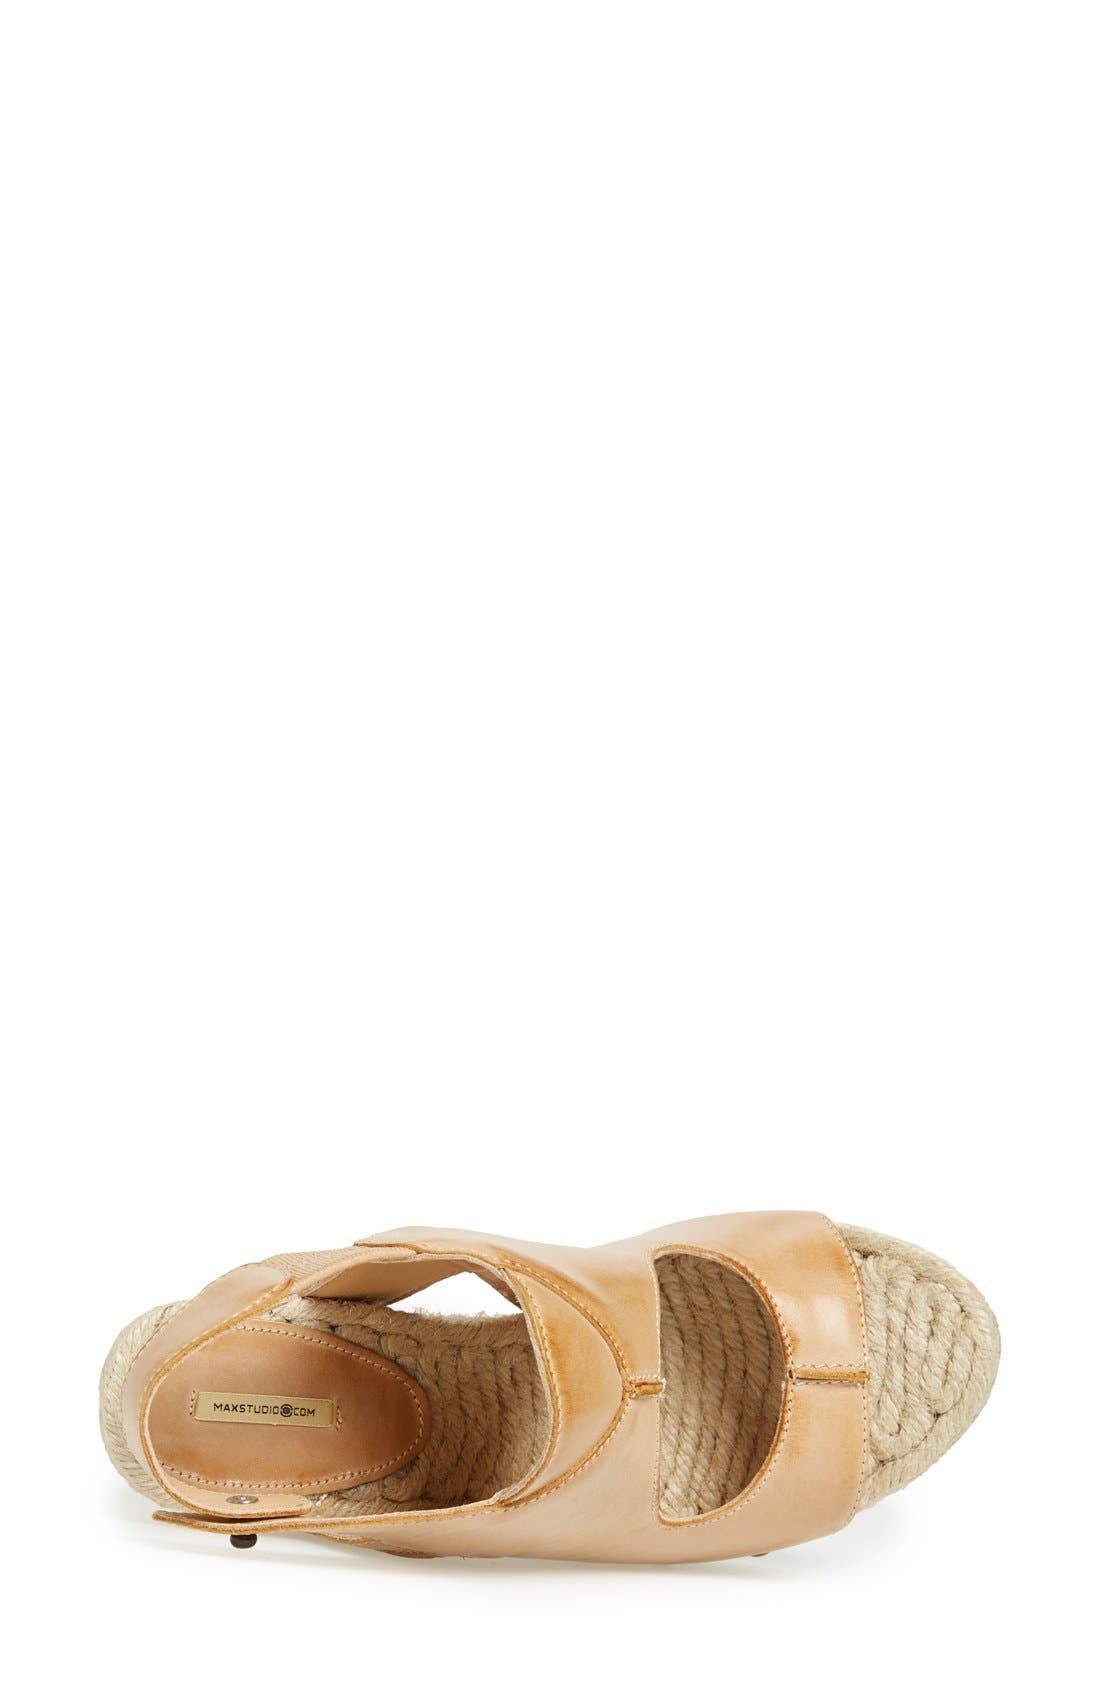 Alternate Image 3  - MAXSTUDIO 'Fiore' Platform Wedge Sandal (Women)